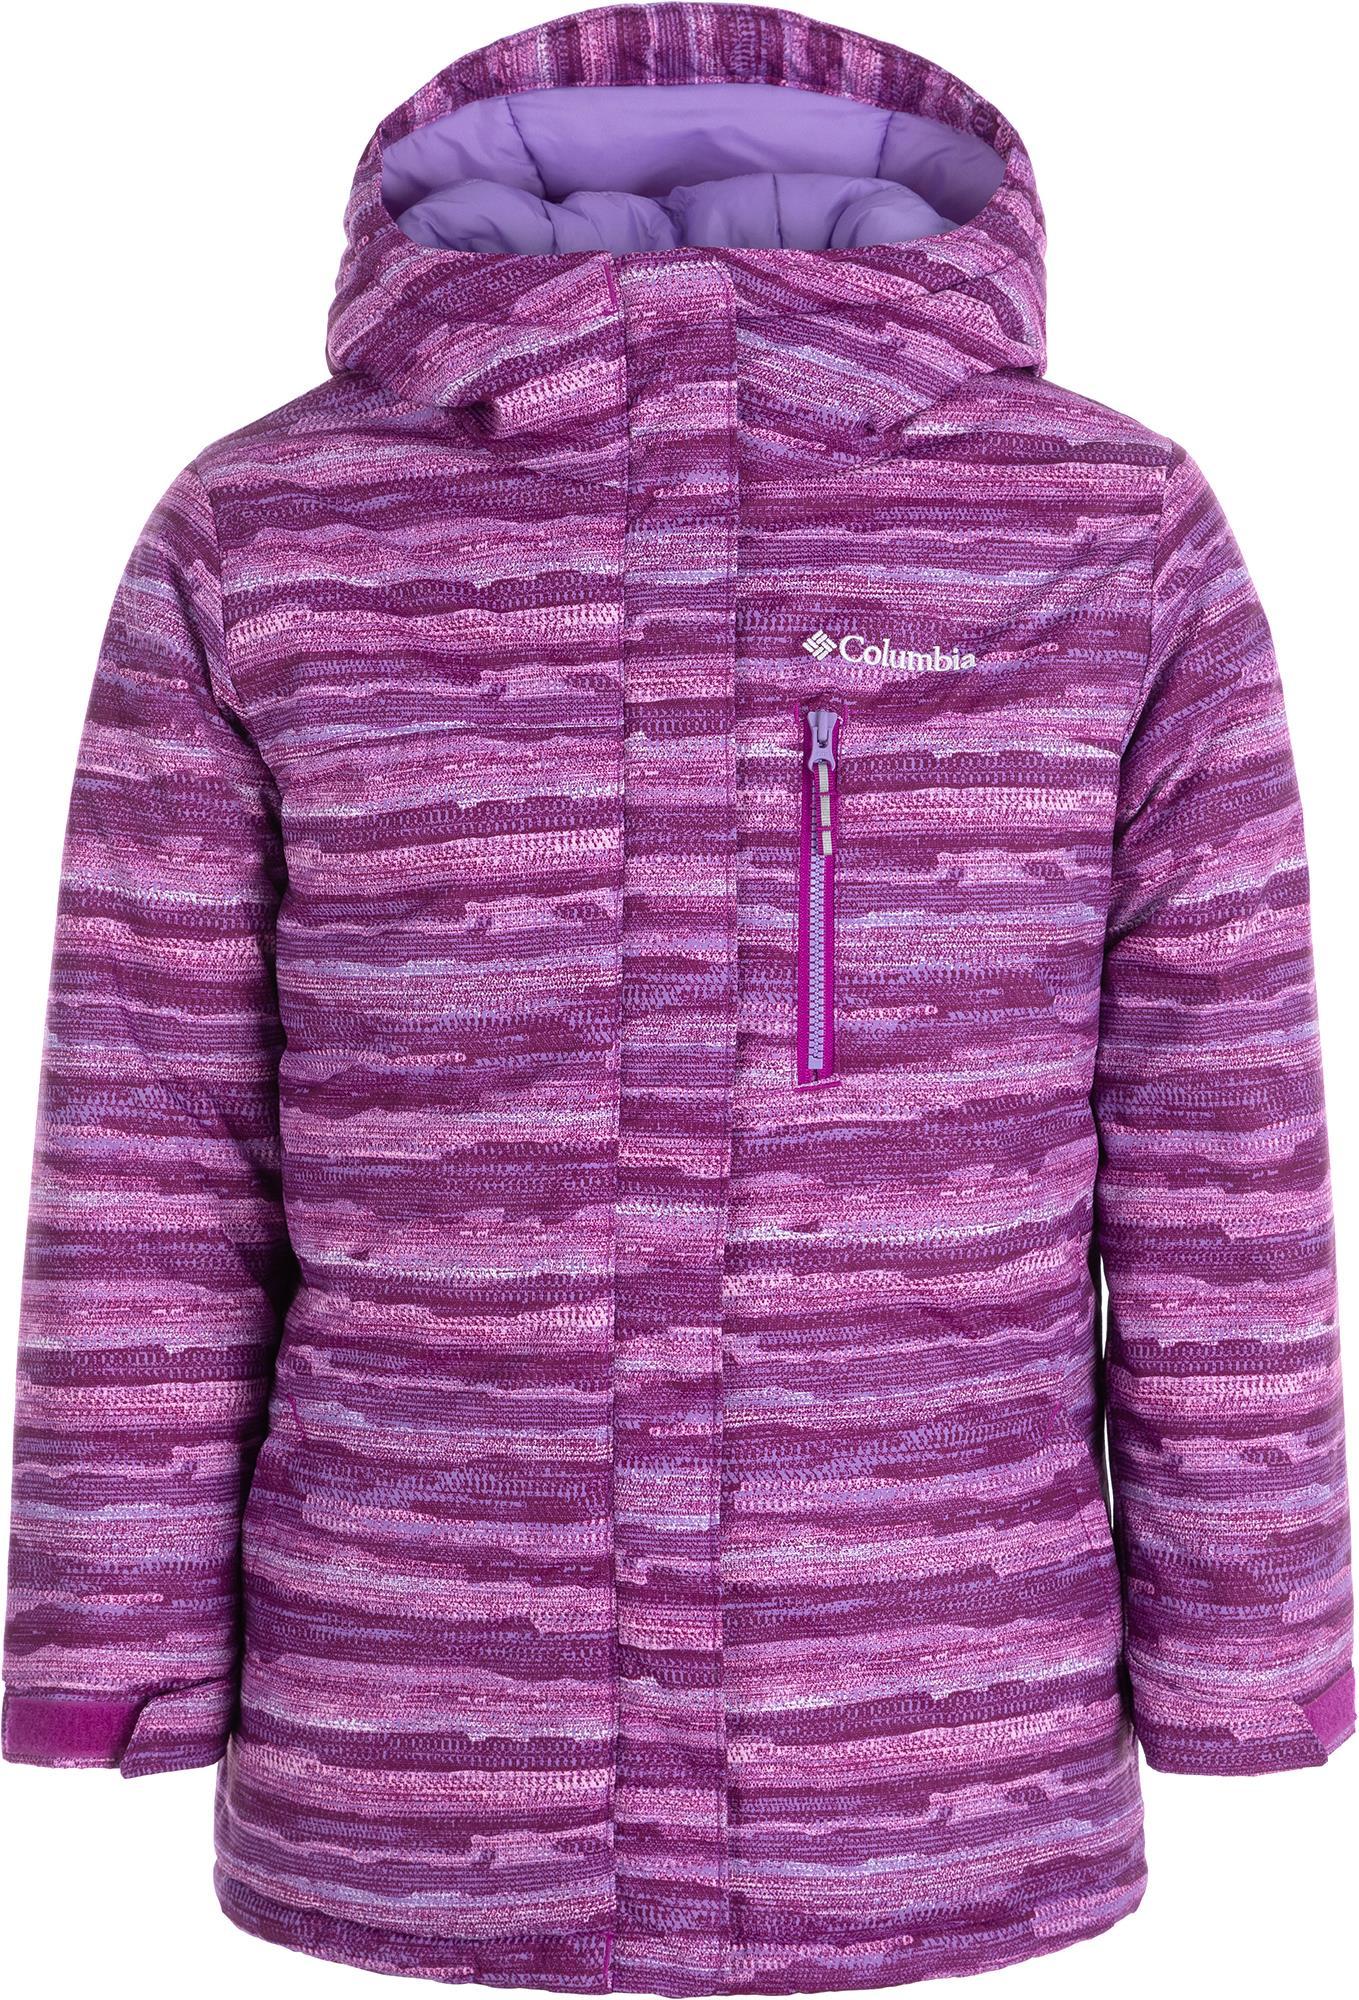 Куртка Columbia Alpine Free Fall Ii Jacket